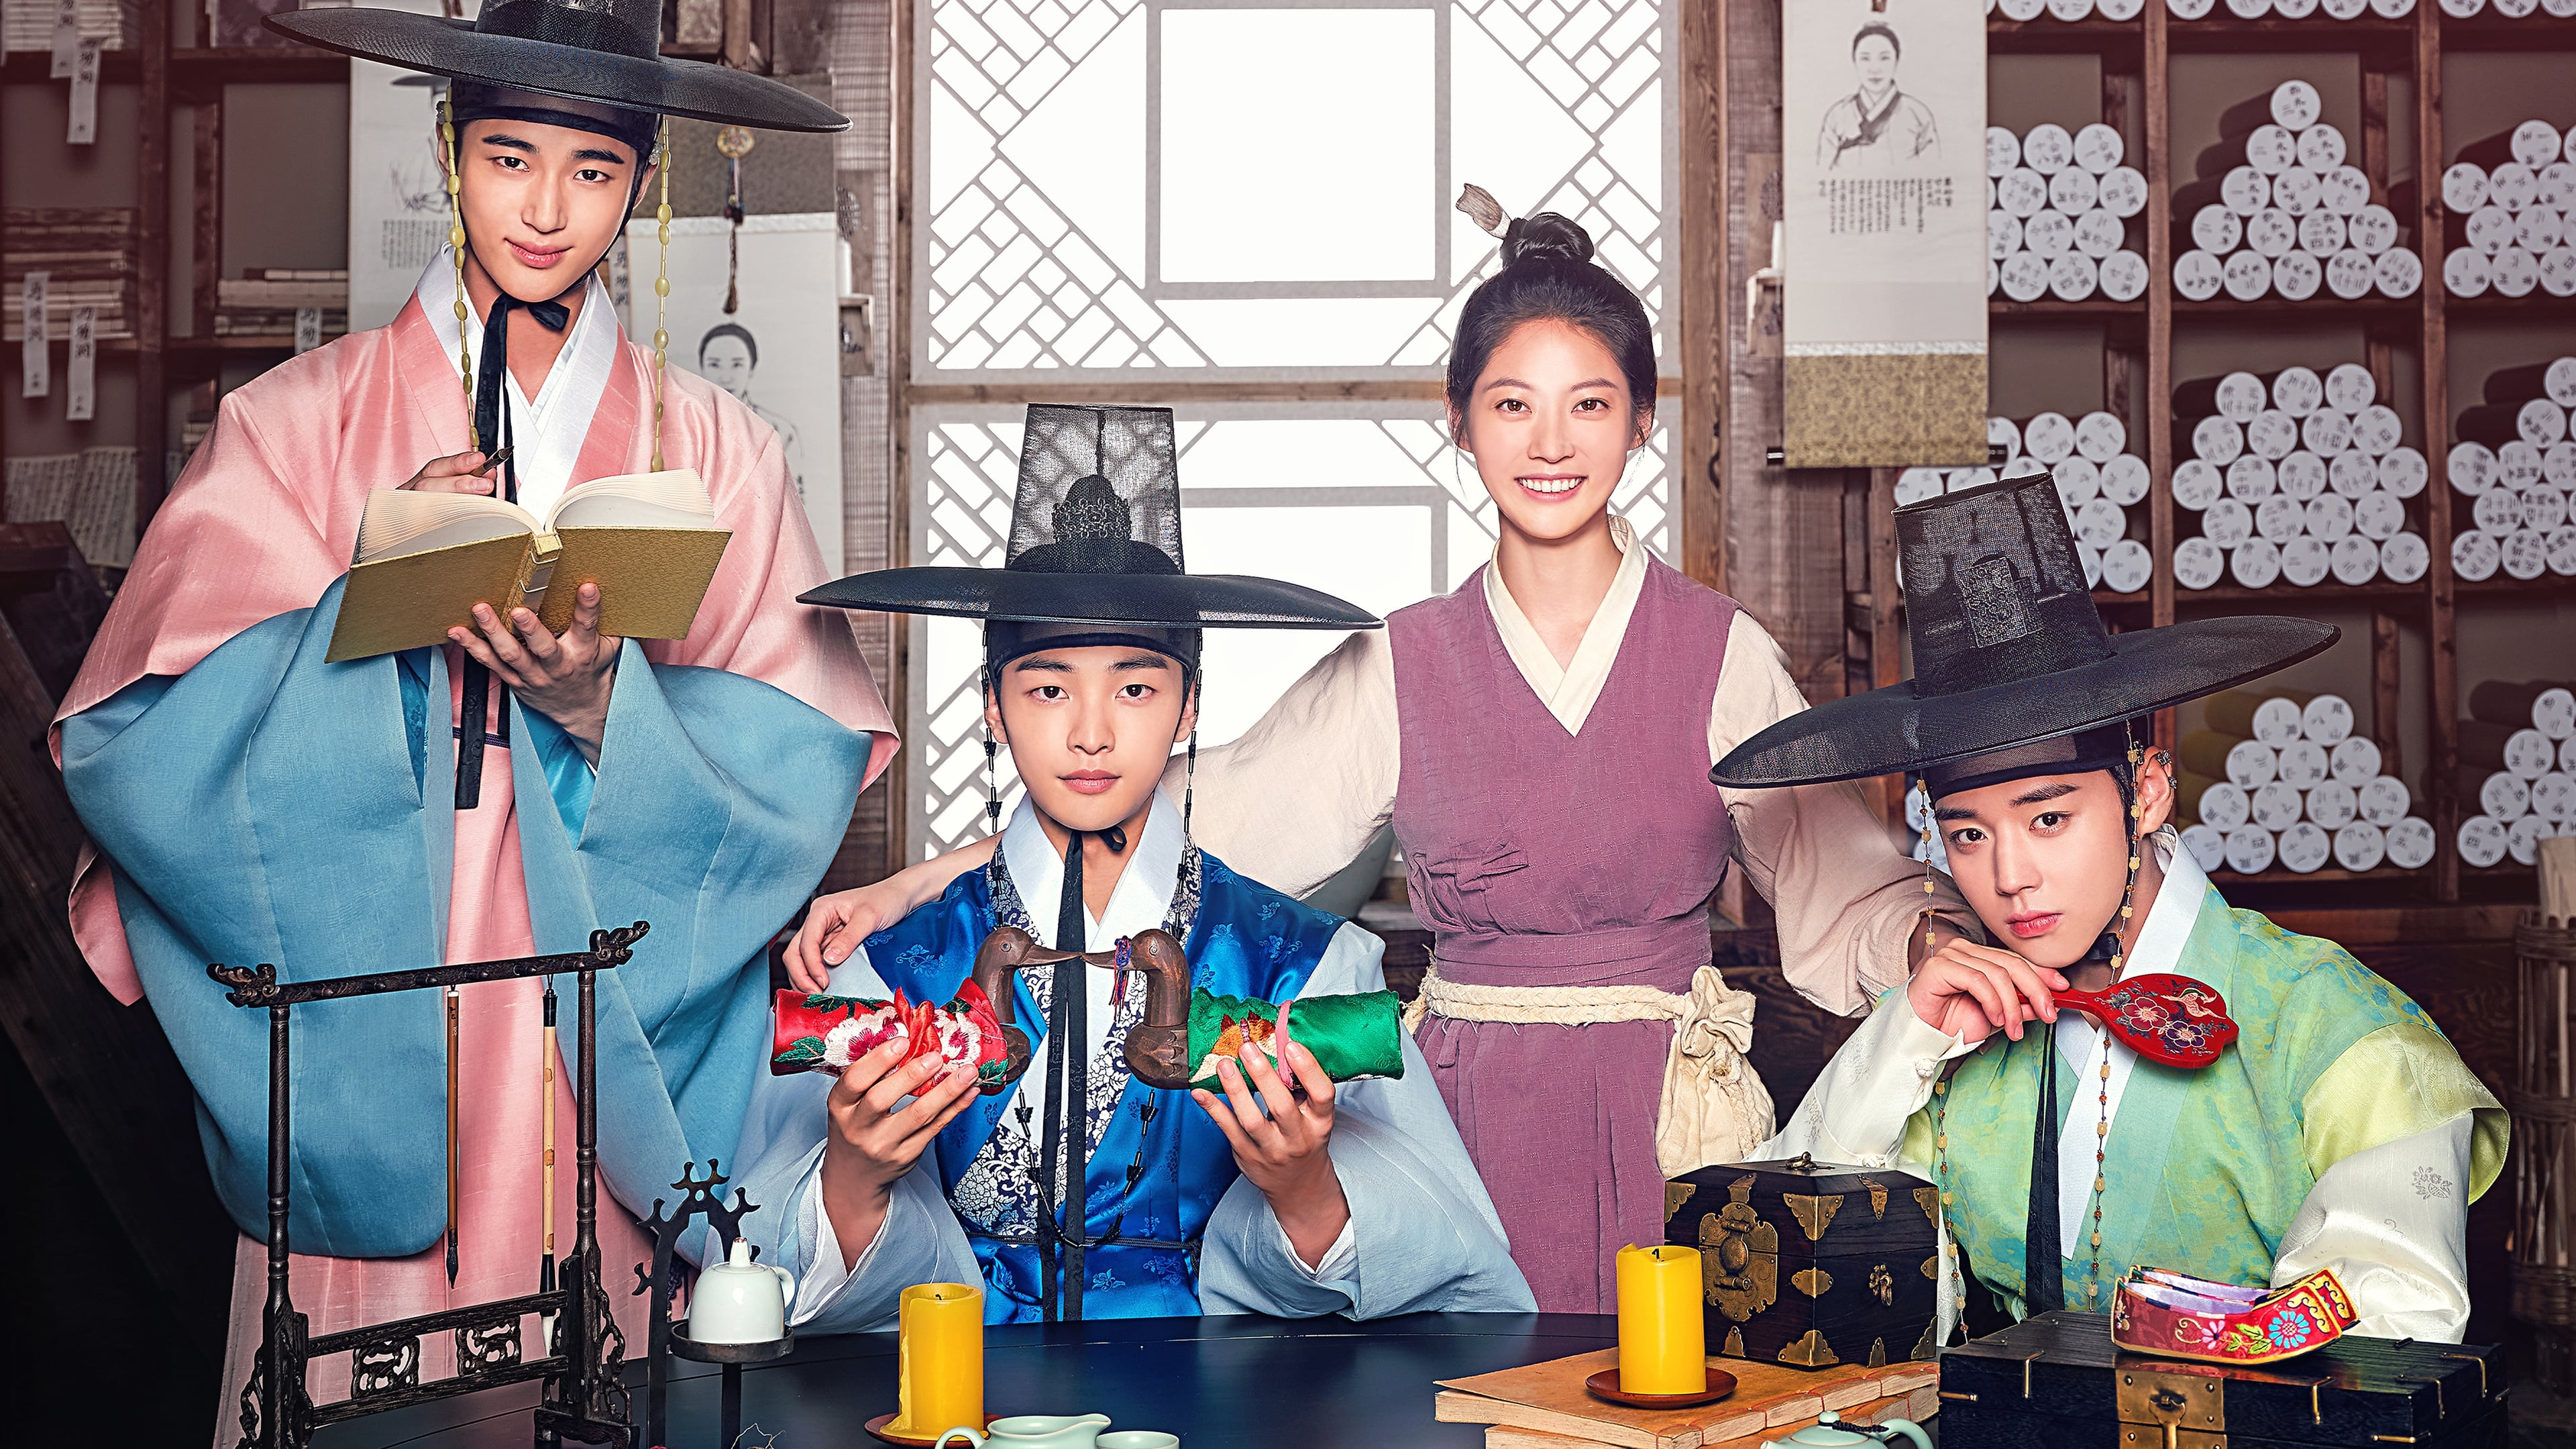 Biệt Đội Hoa Hòe: Trung Tâm Mai Mối Joseon - Flower Crew: Joseon Marriage Agency | Razorphim